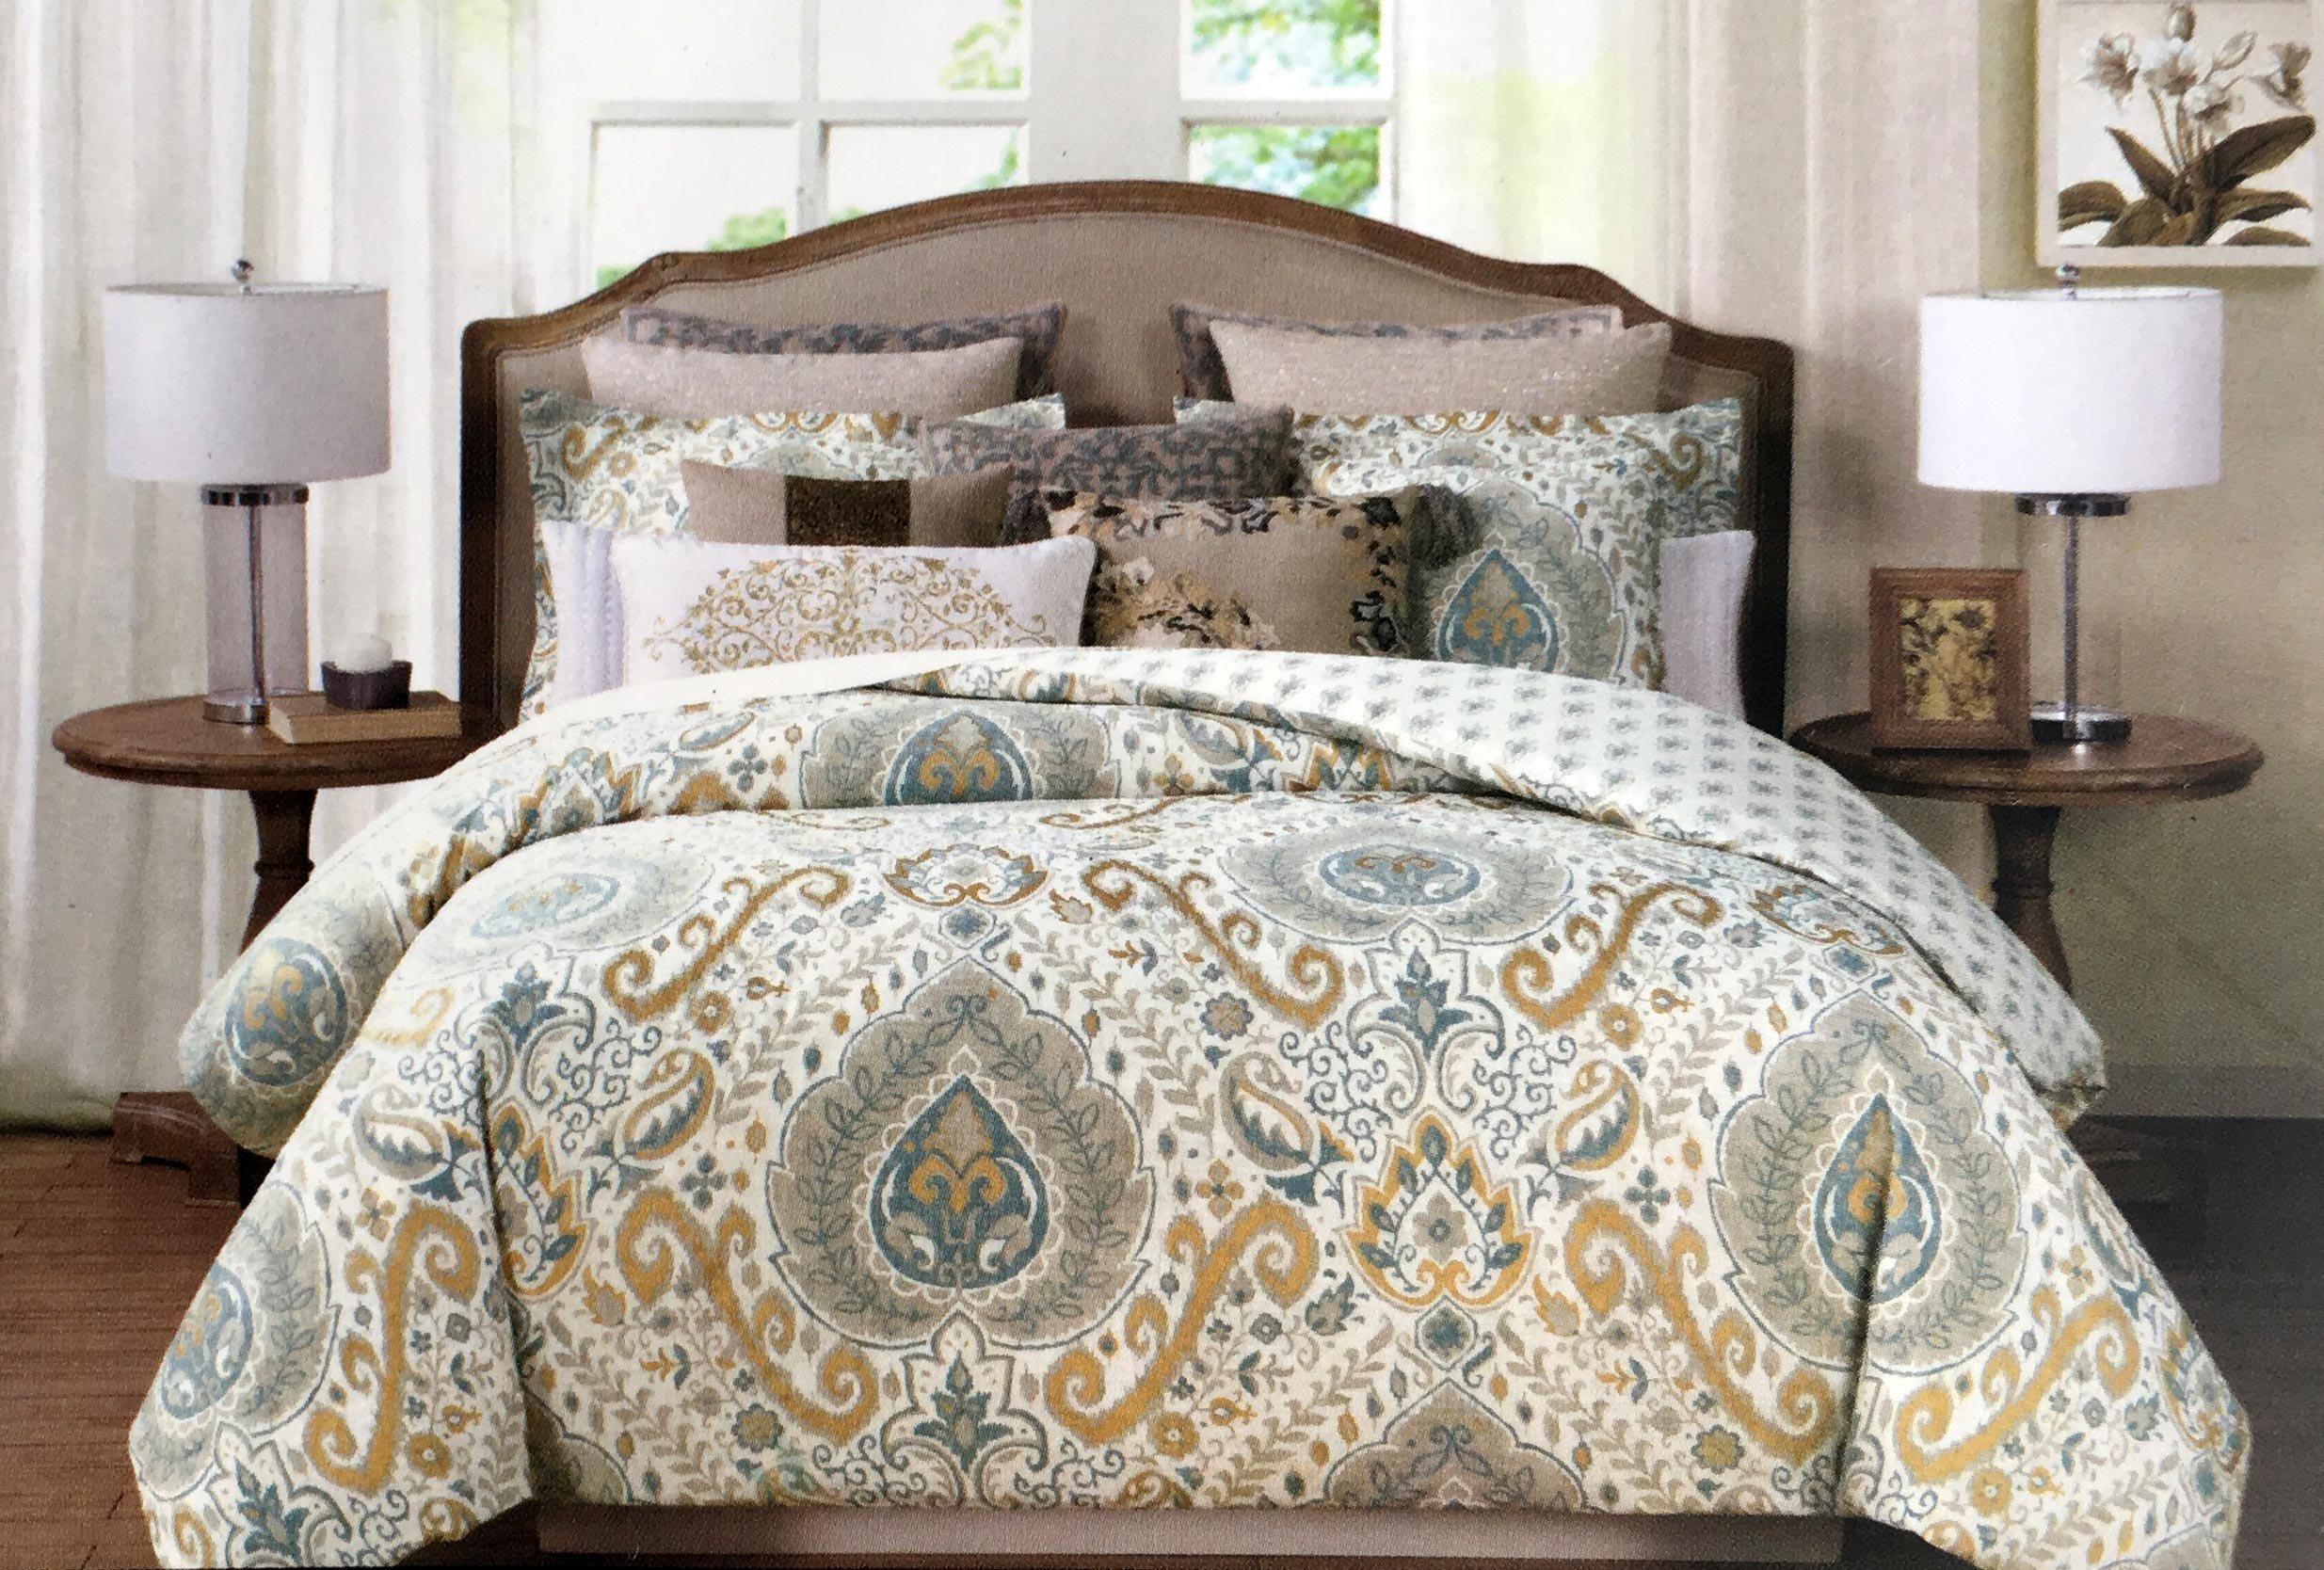 online store tahari bedding 3 piece full queen duvet cover set blue medallion pattern in. Black Bedroom Furniture Sets. Home Design Ideas